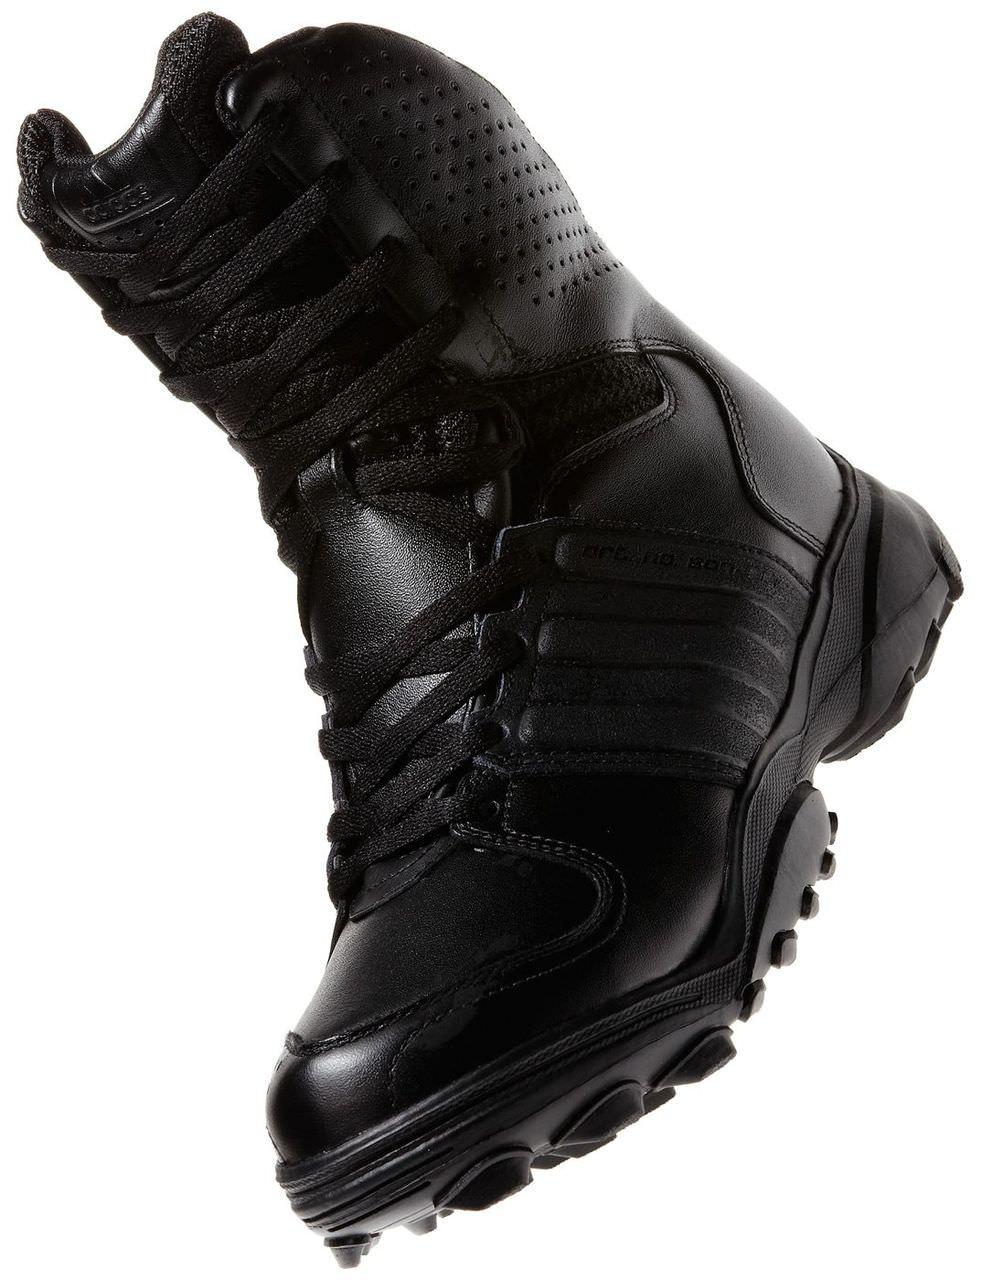 adidas gsg trainers